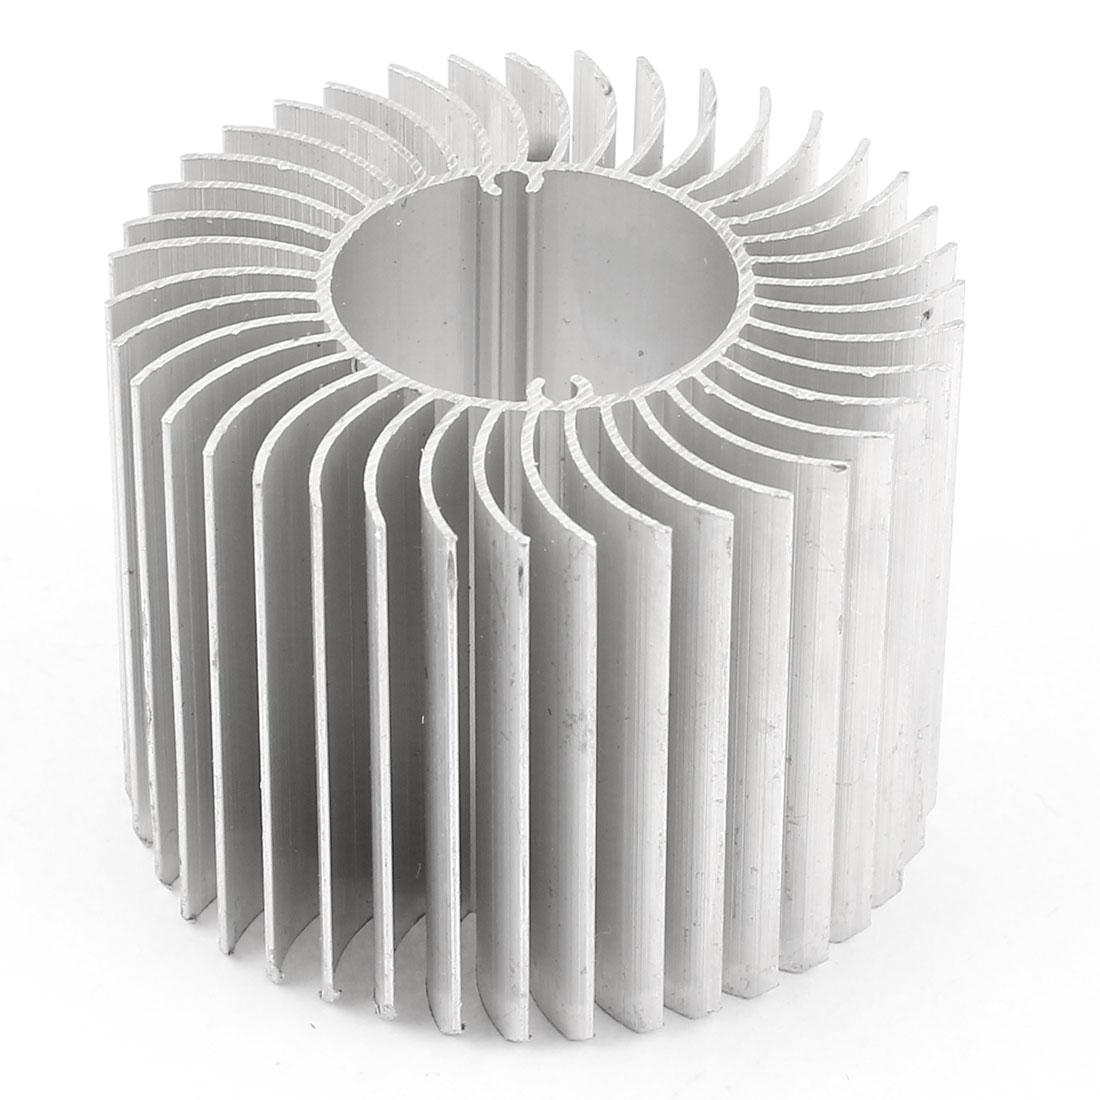 60mm x 45mm Cylinder 4W High Power LED Heatsink Aluminium Cooling Fin